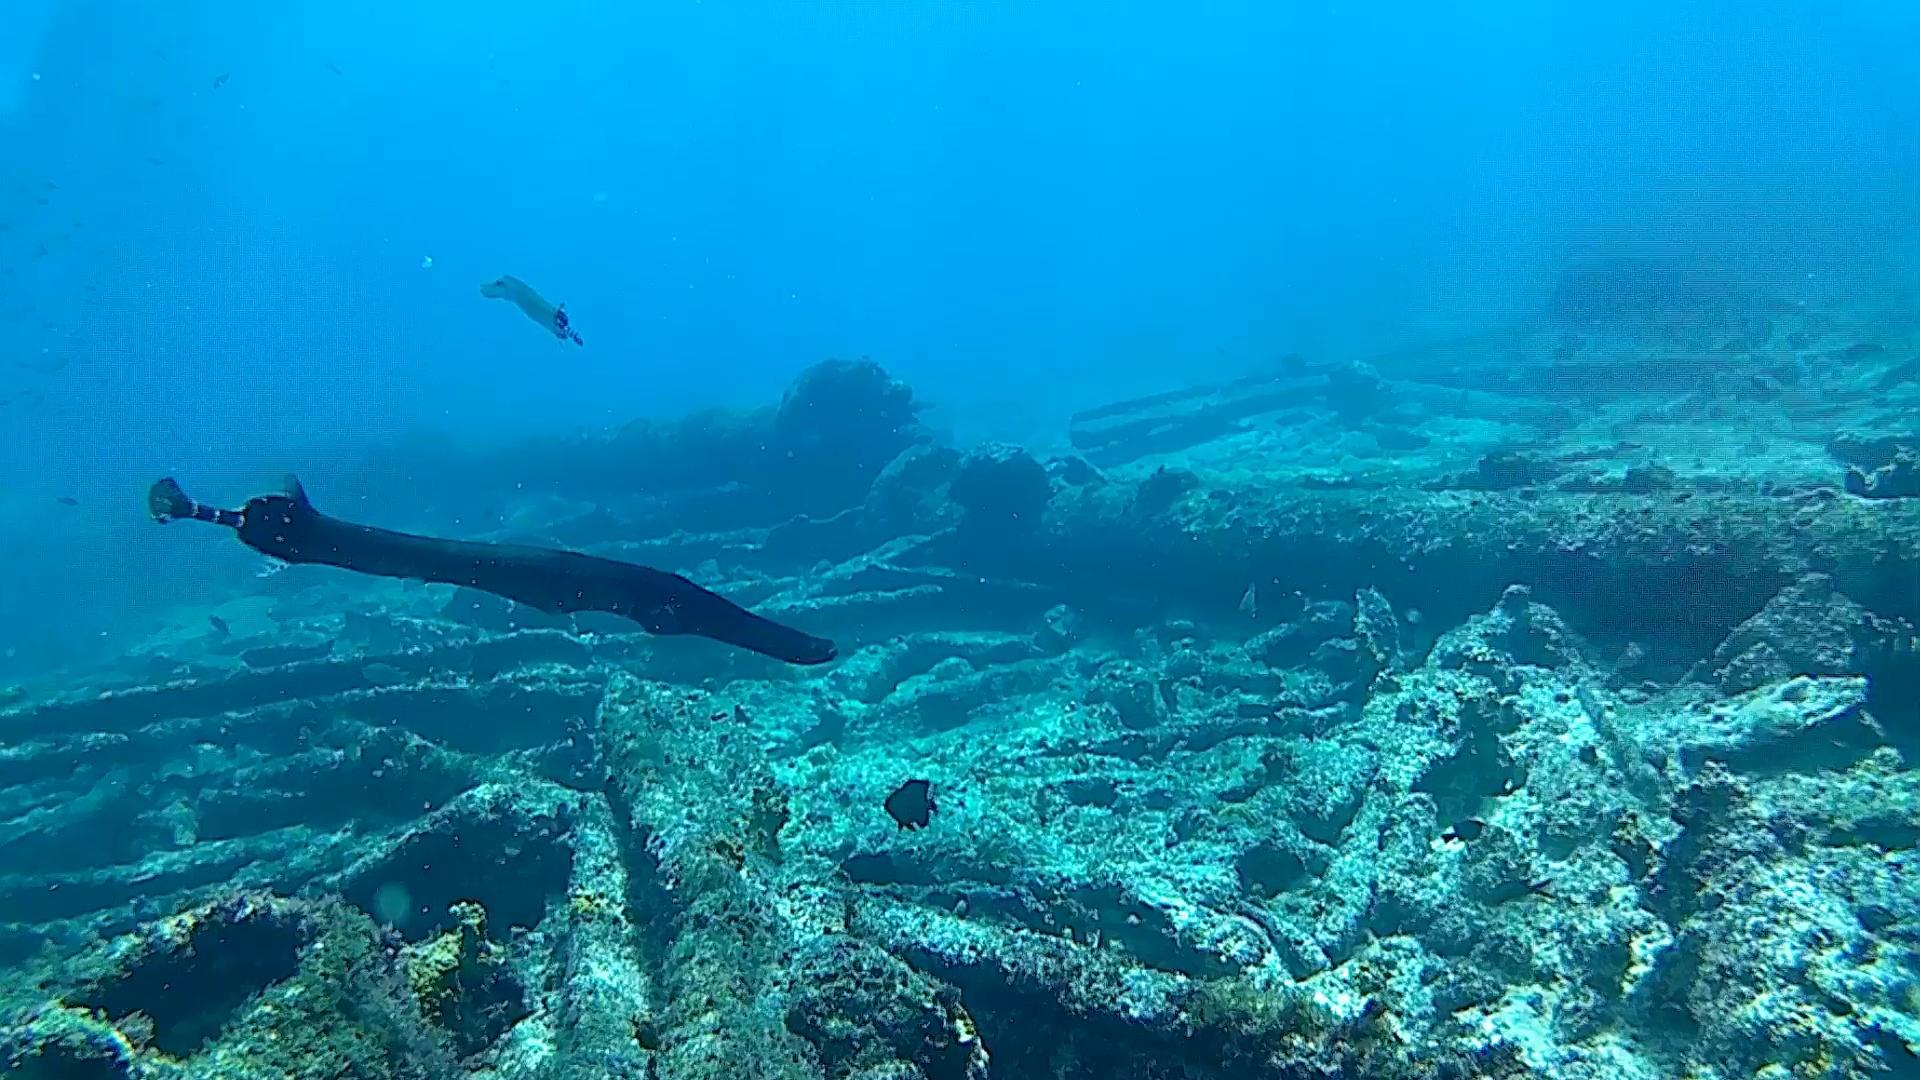 Pesce trombetta - Aulostomidae- intotheblue.it